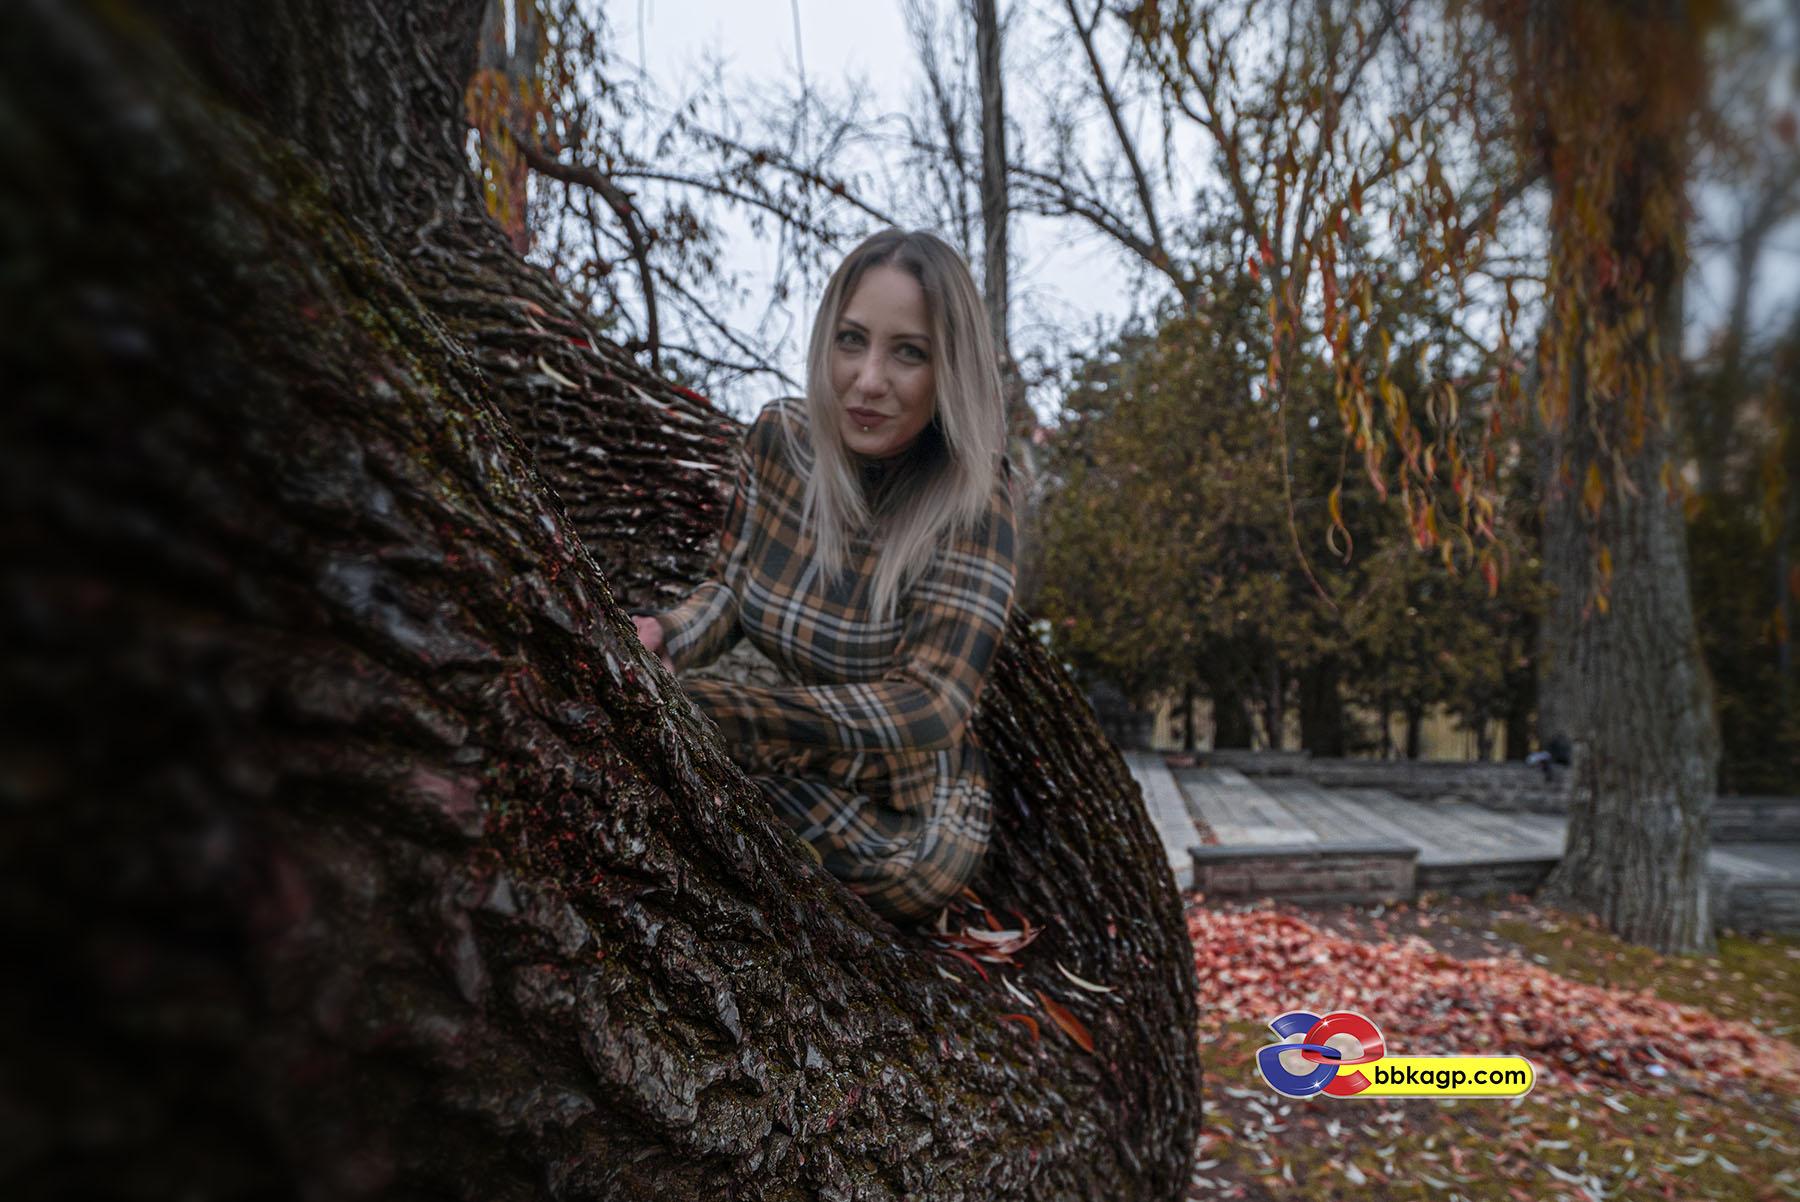 Fotograf Cekimi katalog Ankara